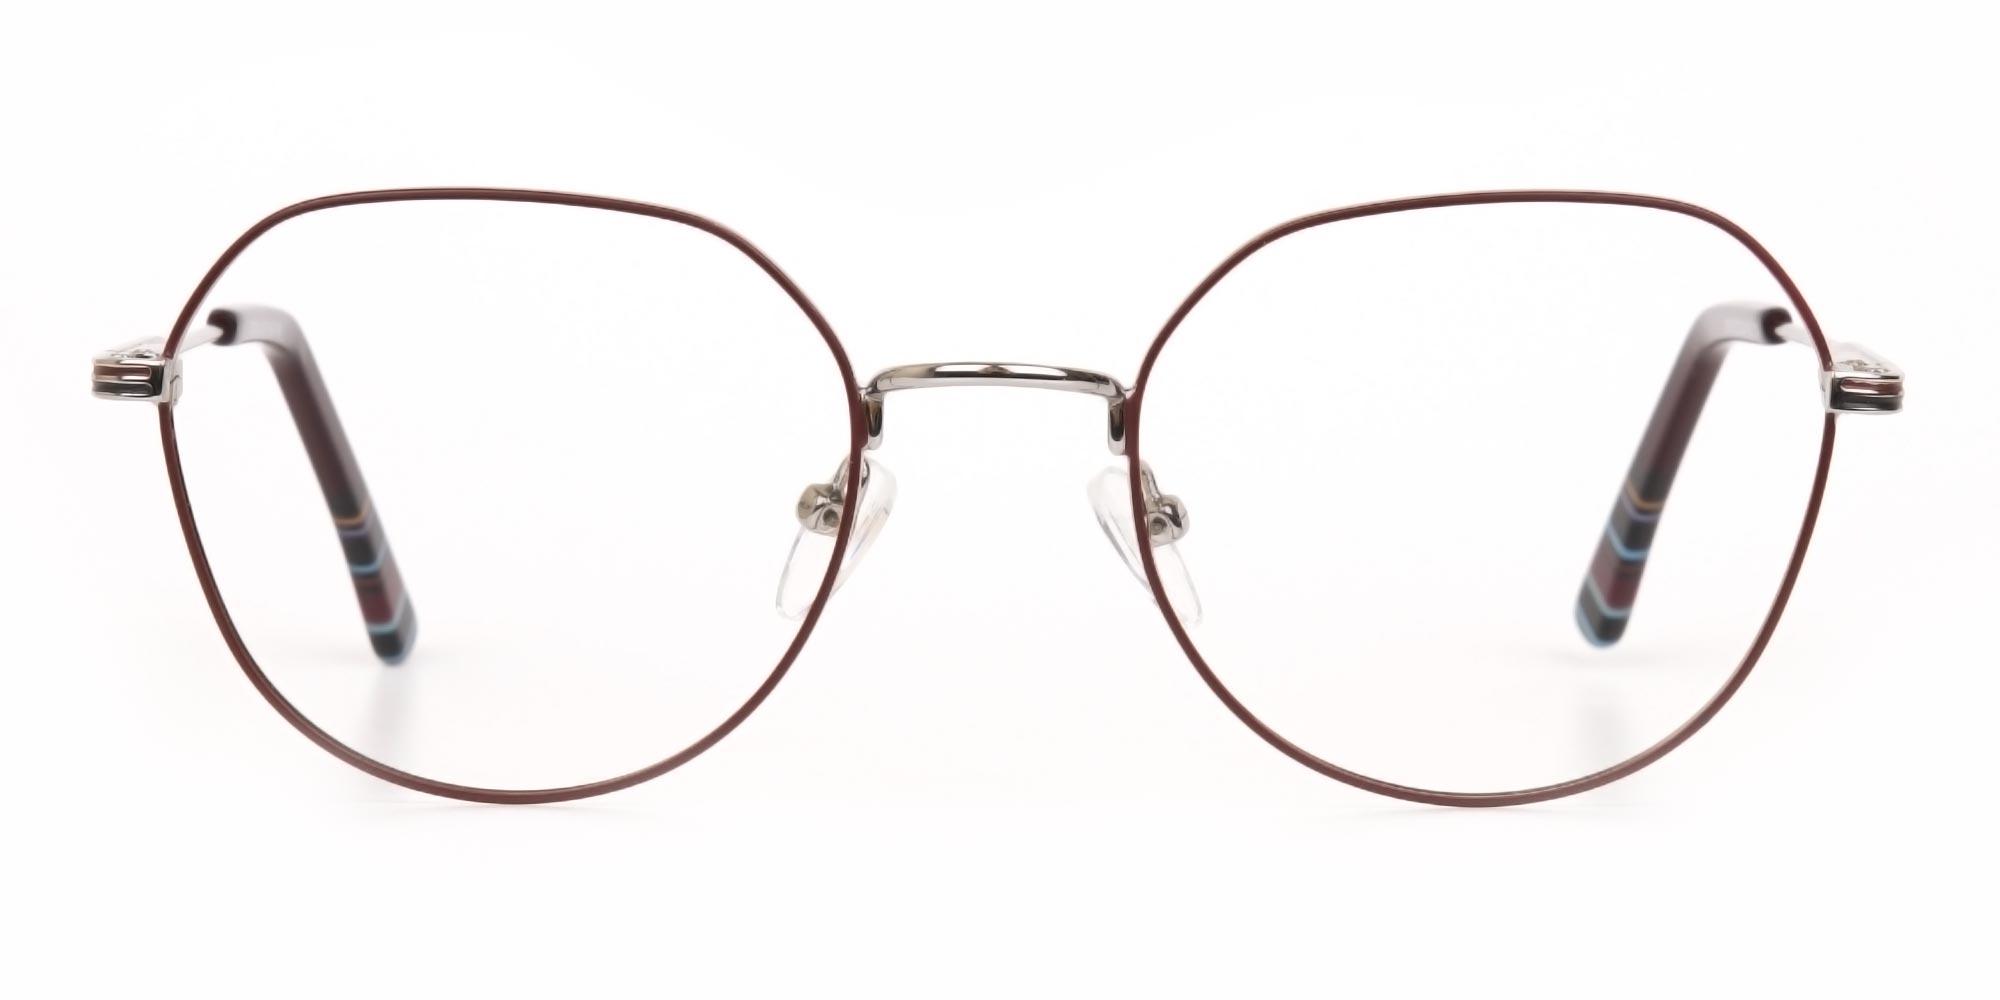 Oversized Wayfarer Glasses in Burgundy & Silver